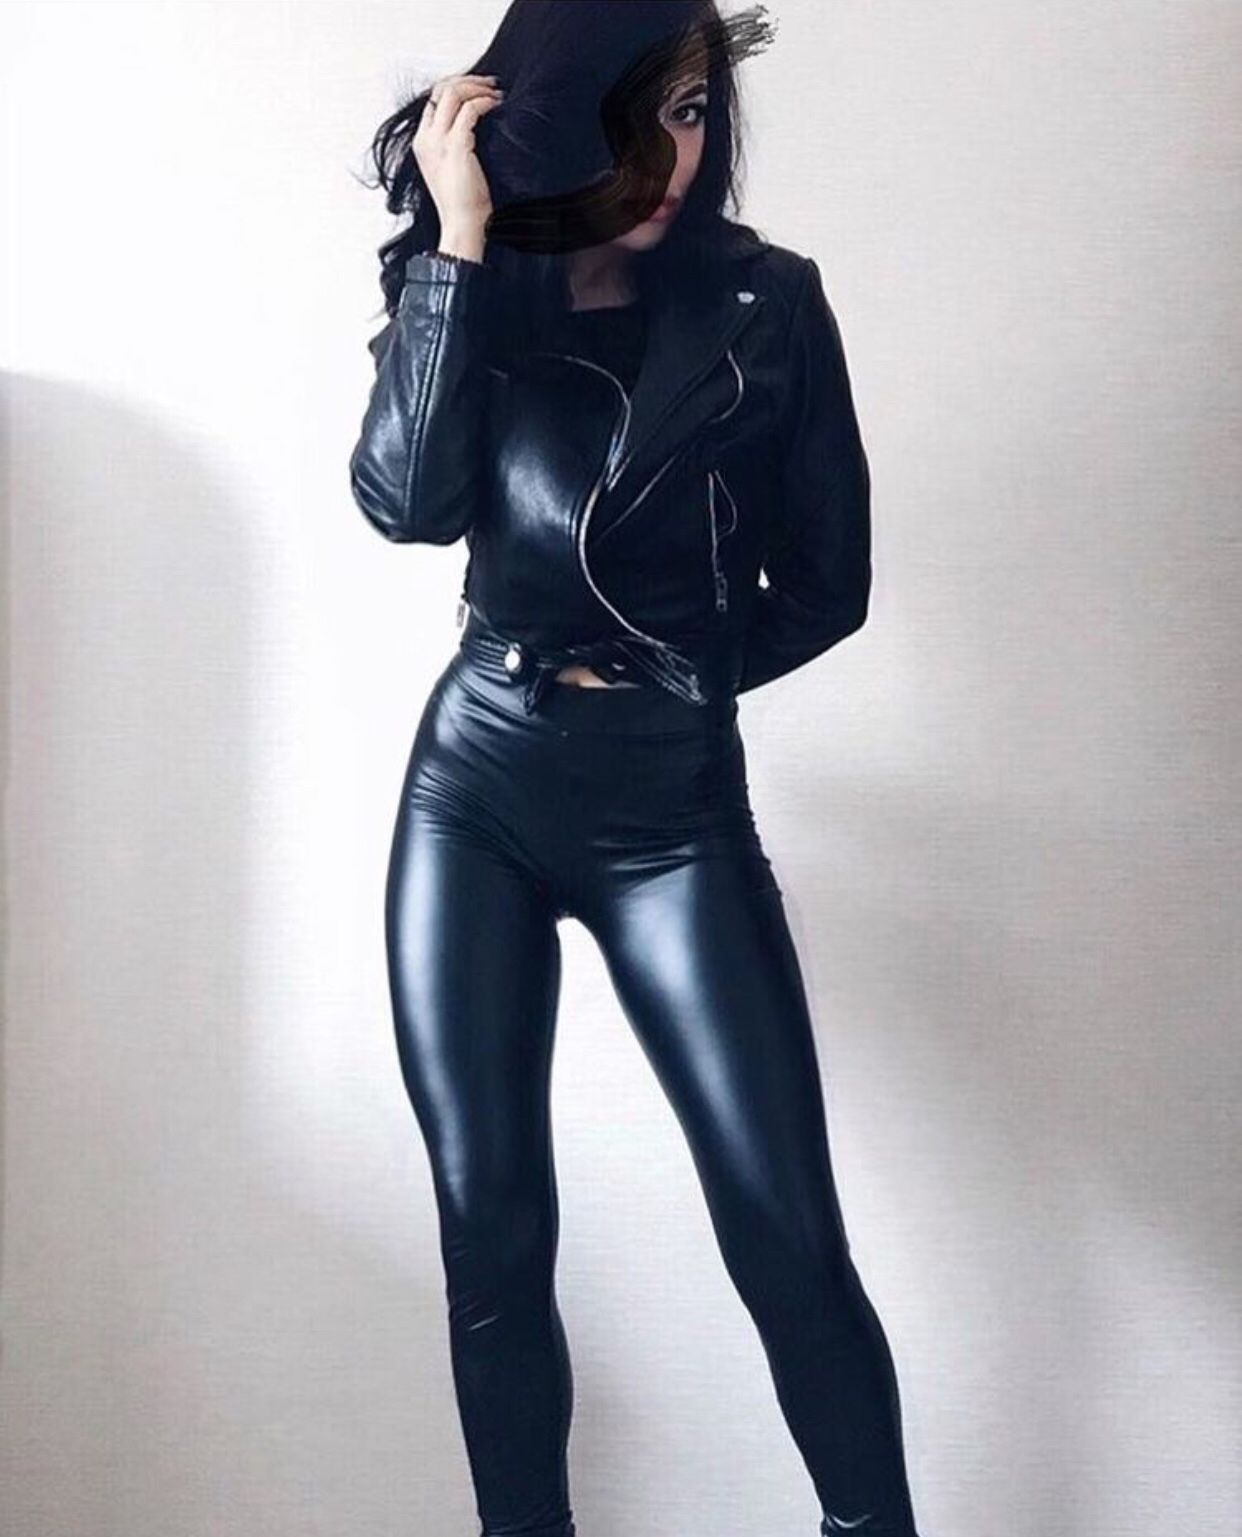 321ec789ee876 #nugoth #gothic #gothicfashion #gothicmakeup #gothicart #gothicbeauty  #gothicwedding #gothnails #gothgirl #gothicgirl #gothicwomen #gothwomen